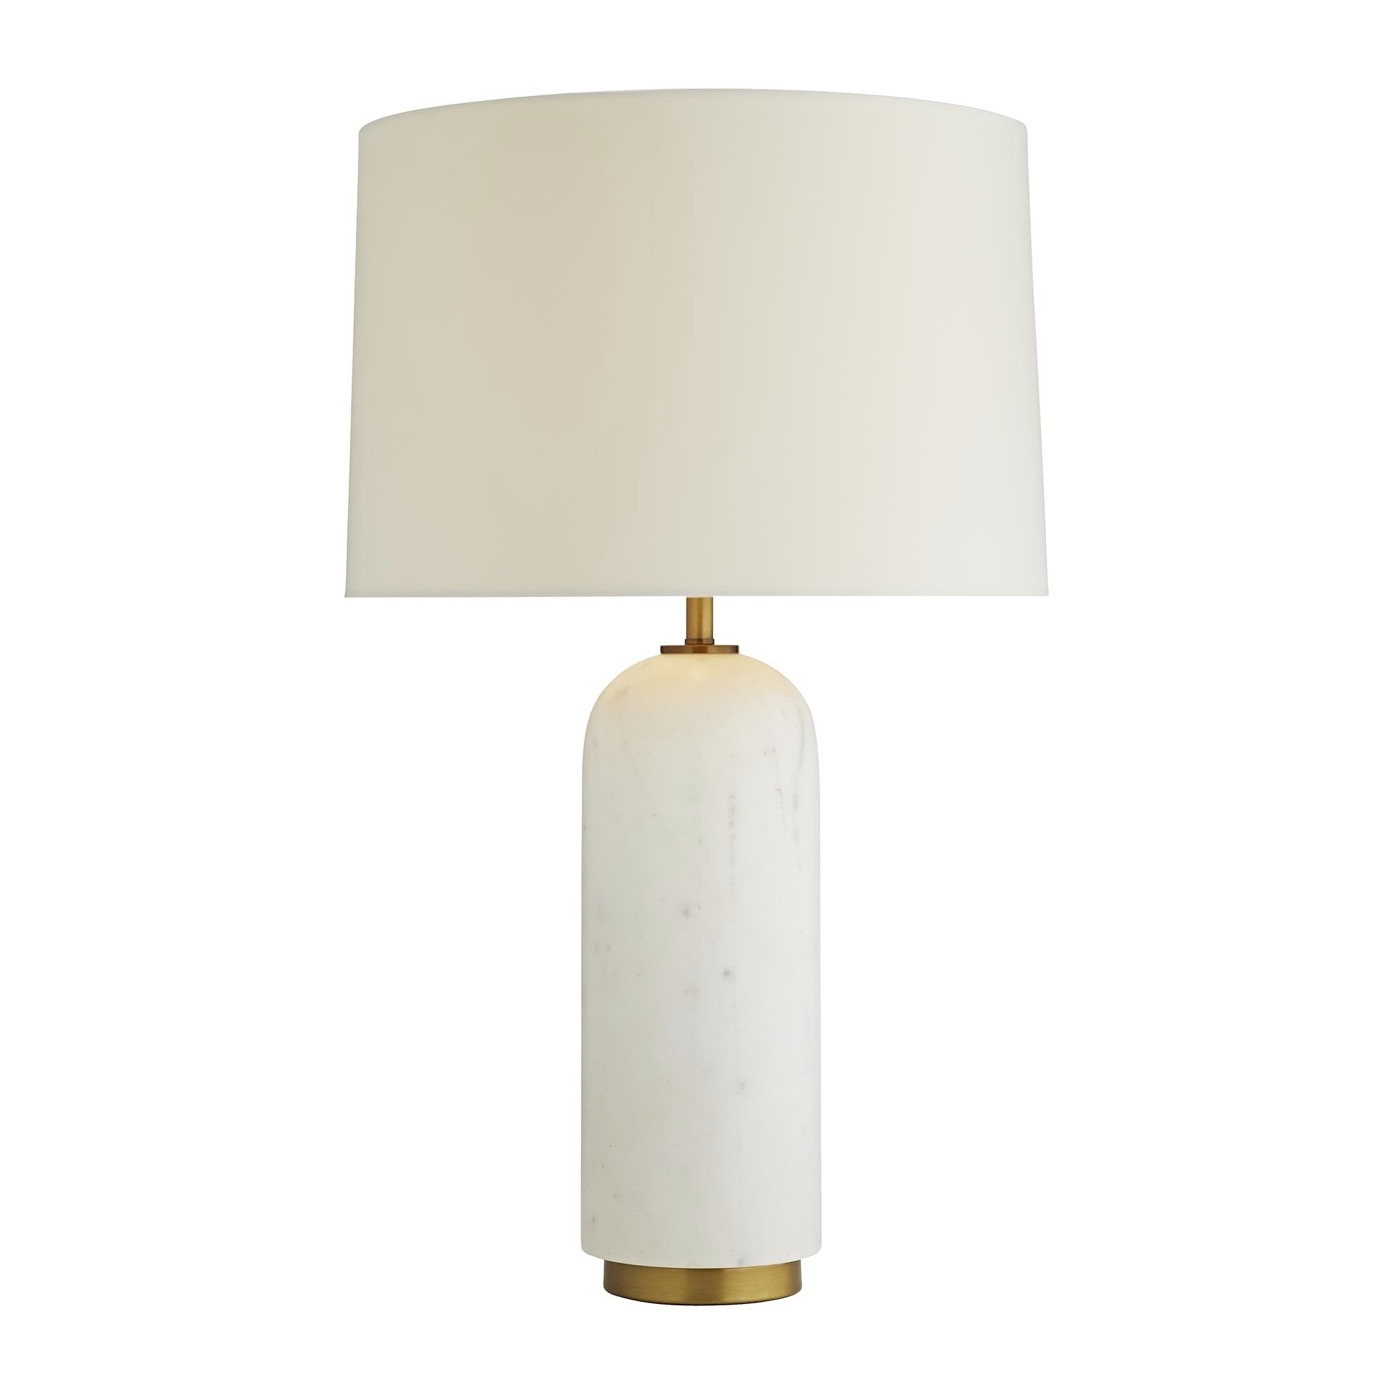 Shania Marble Table Lamp